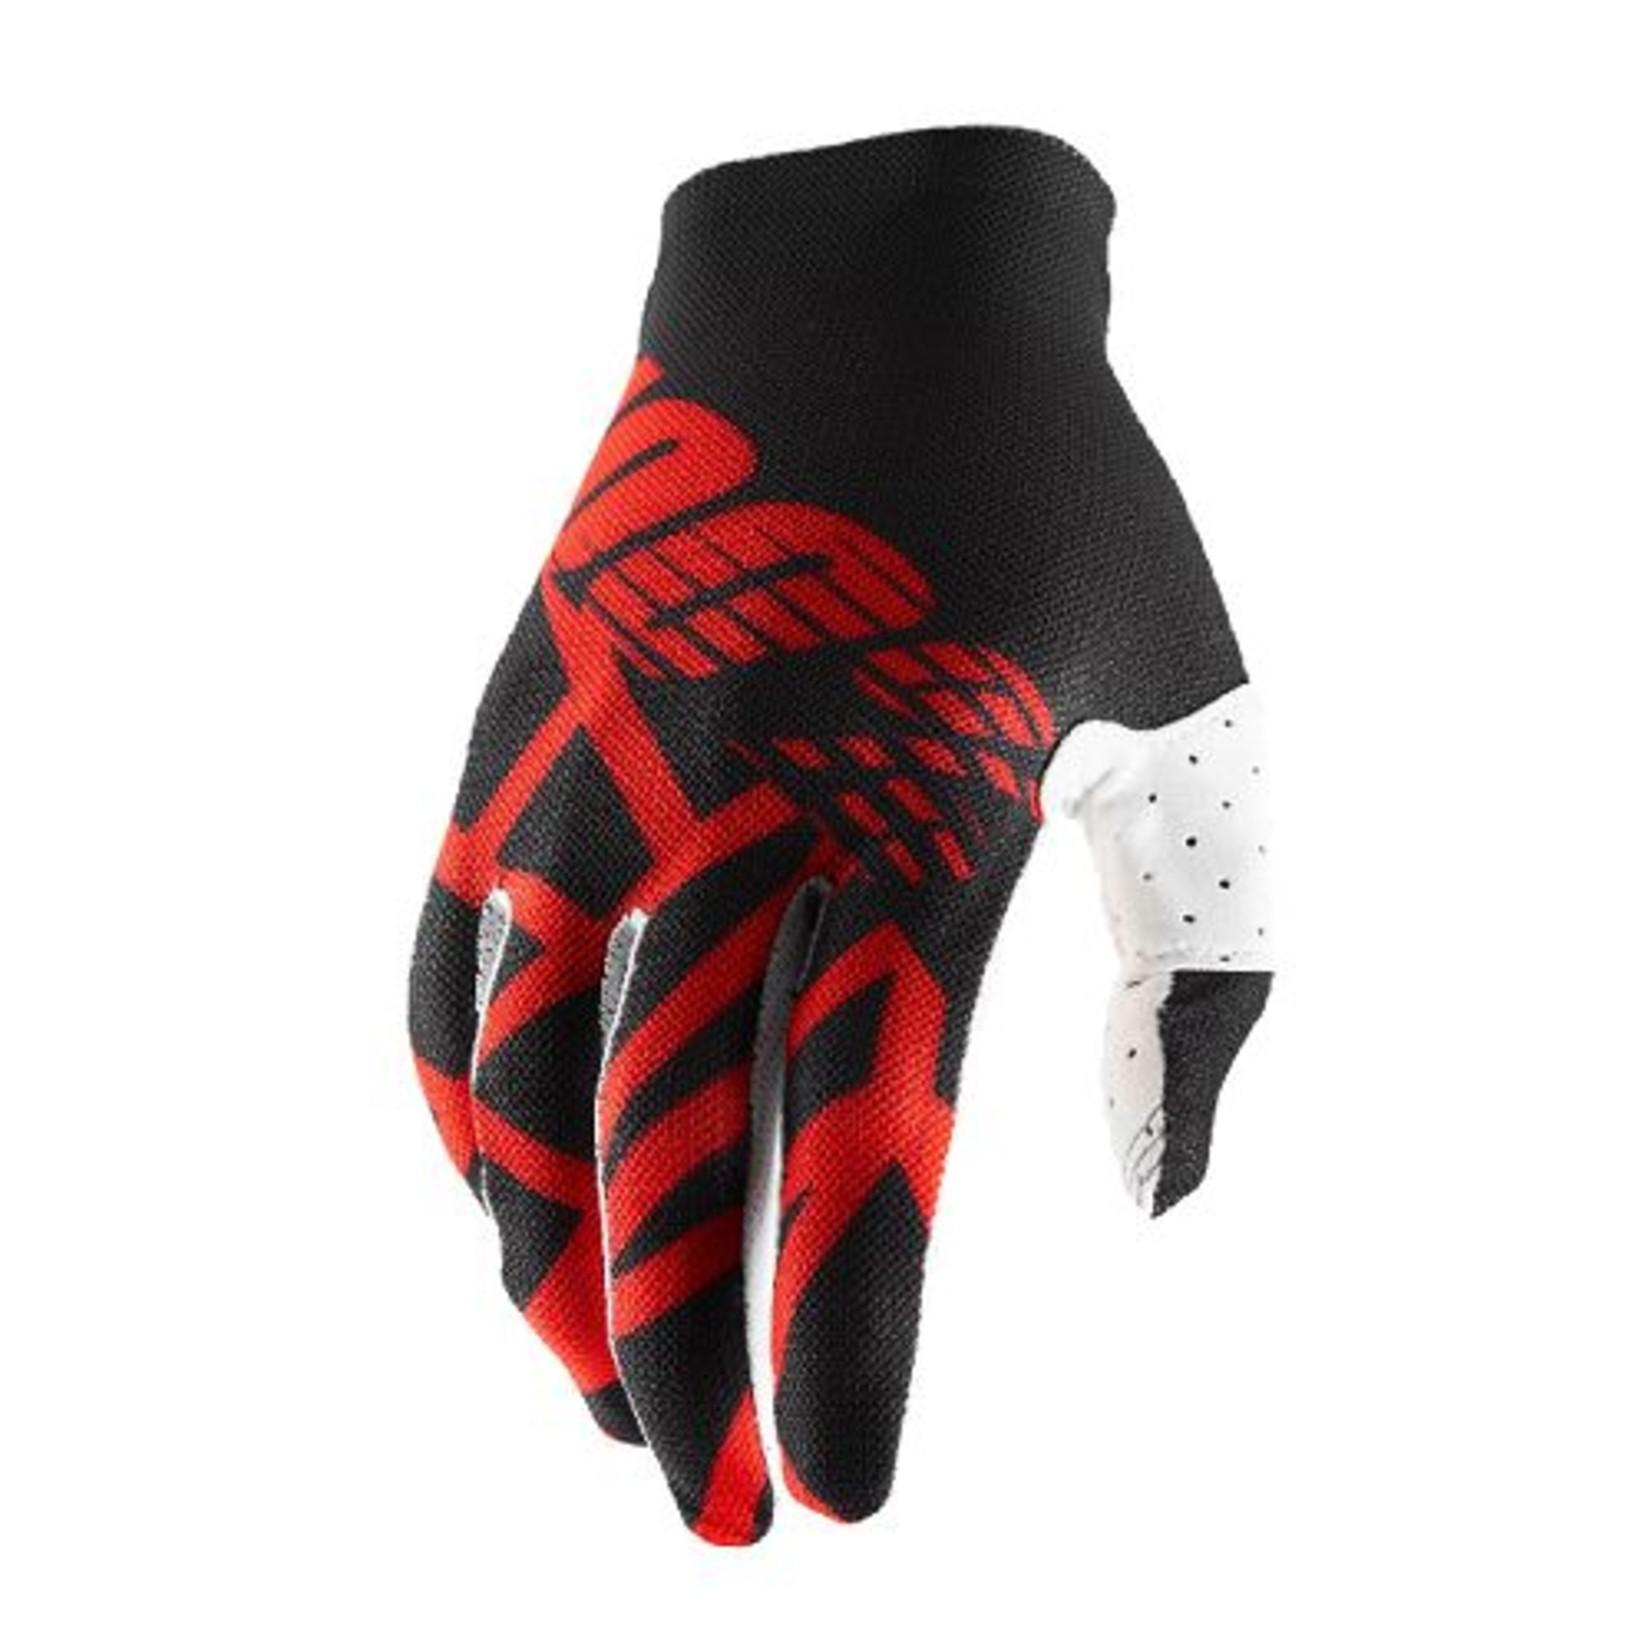 100% 100% Celium 2 Glove Black/Red/White